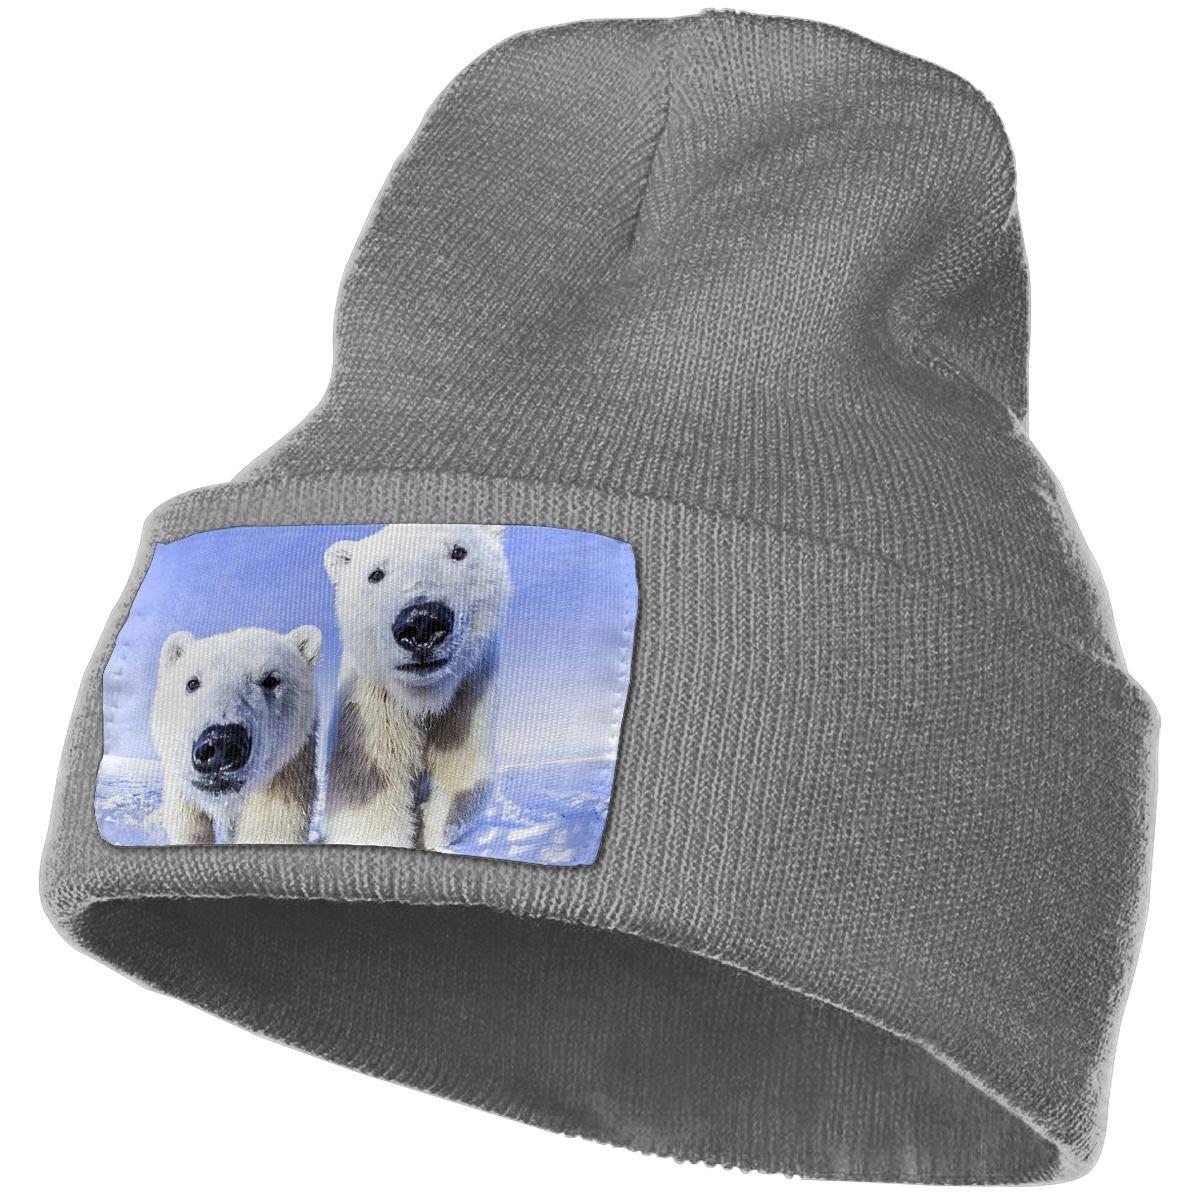 Deep Heather Beanie Hats Hats Hats Baby Bear Knit Hedging